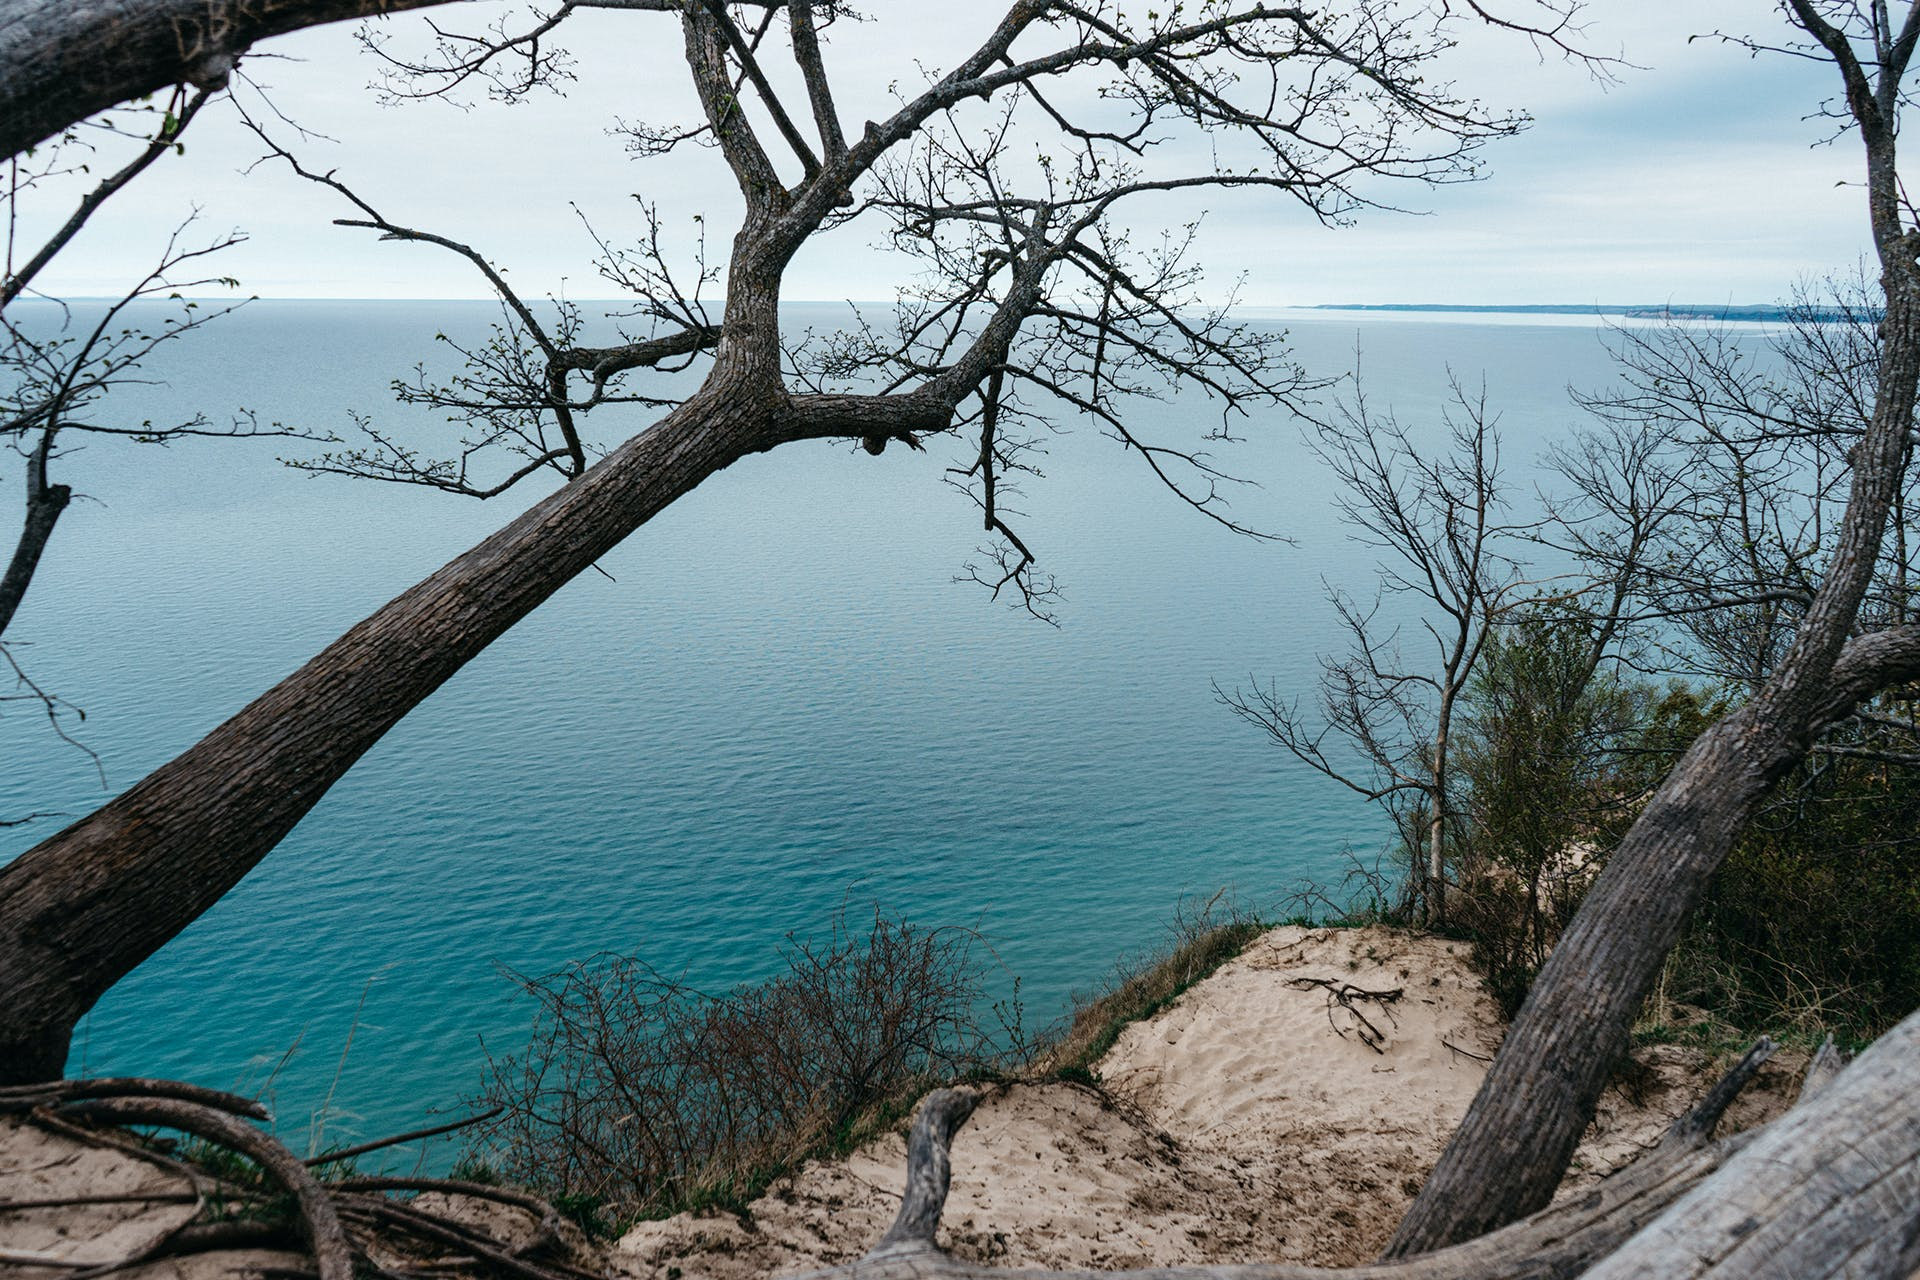 Bare Tree Near Blue Ocean